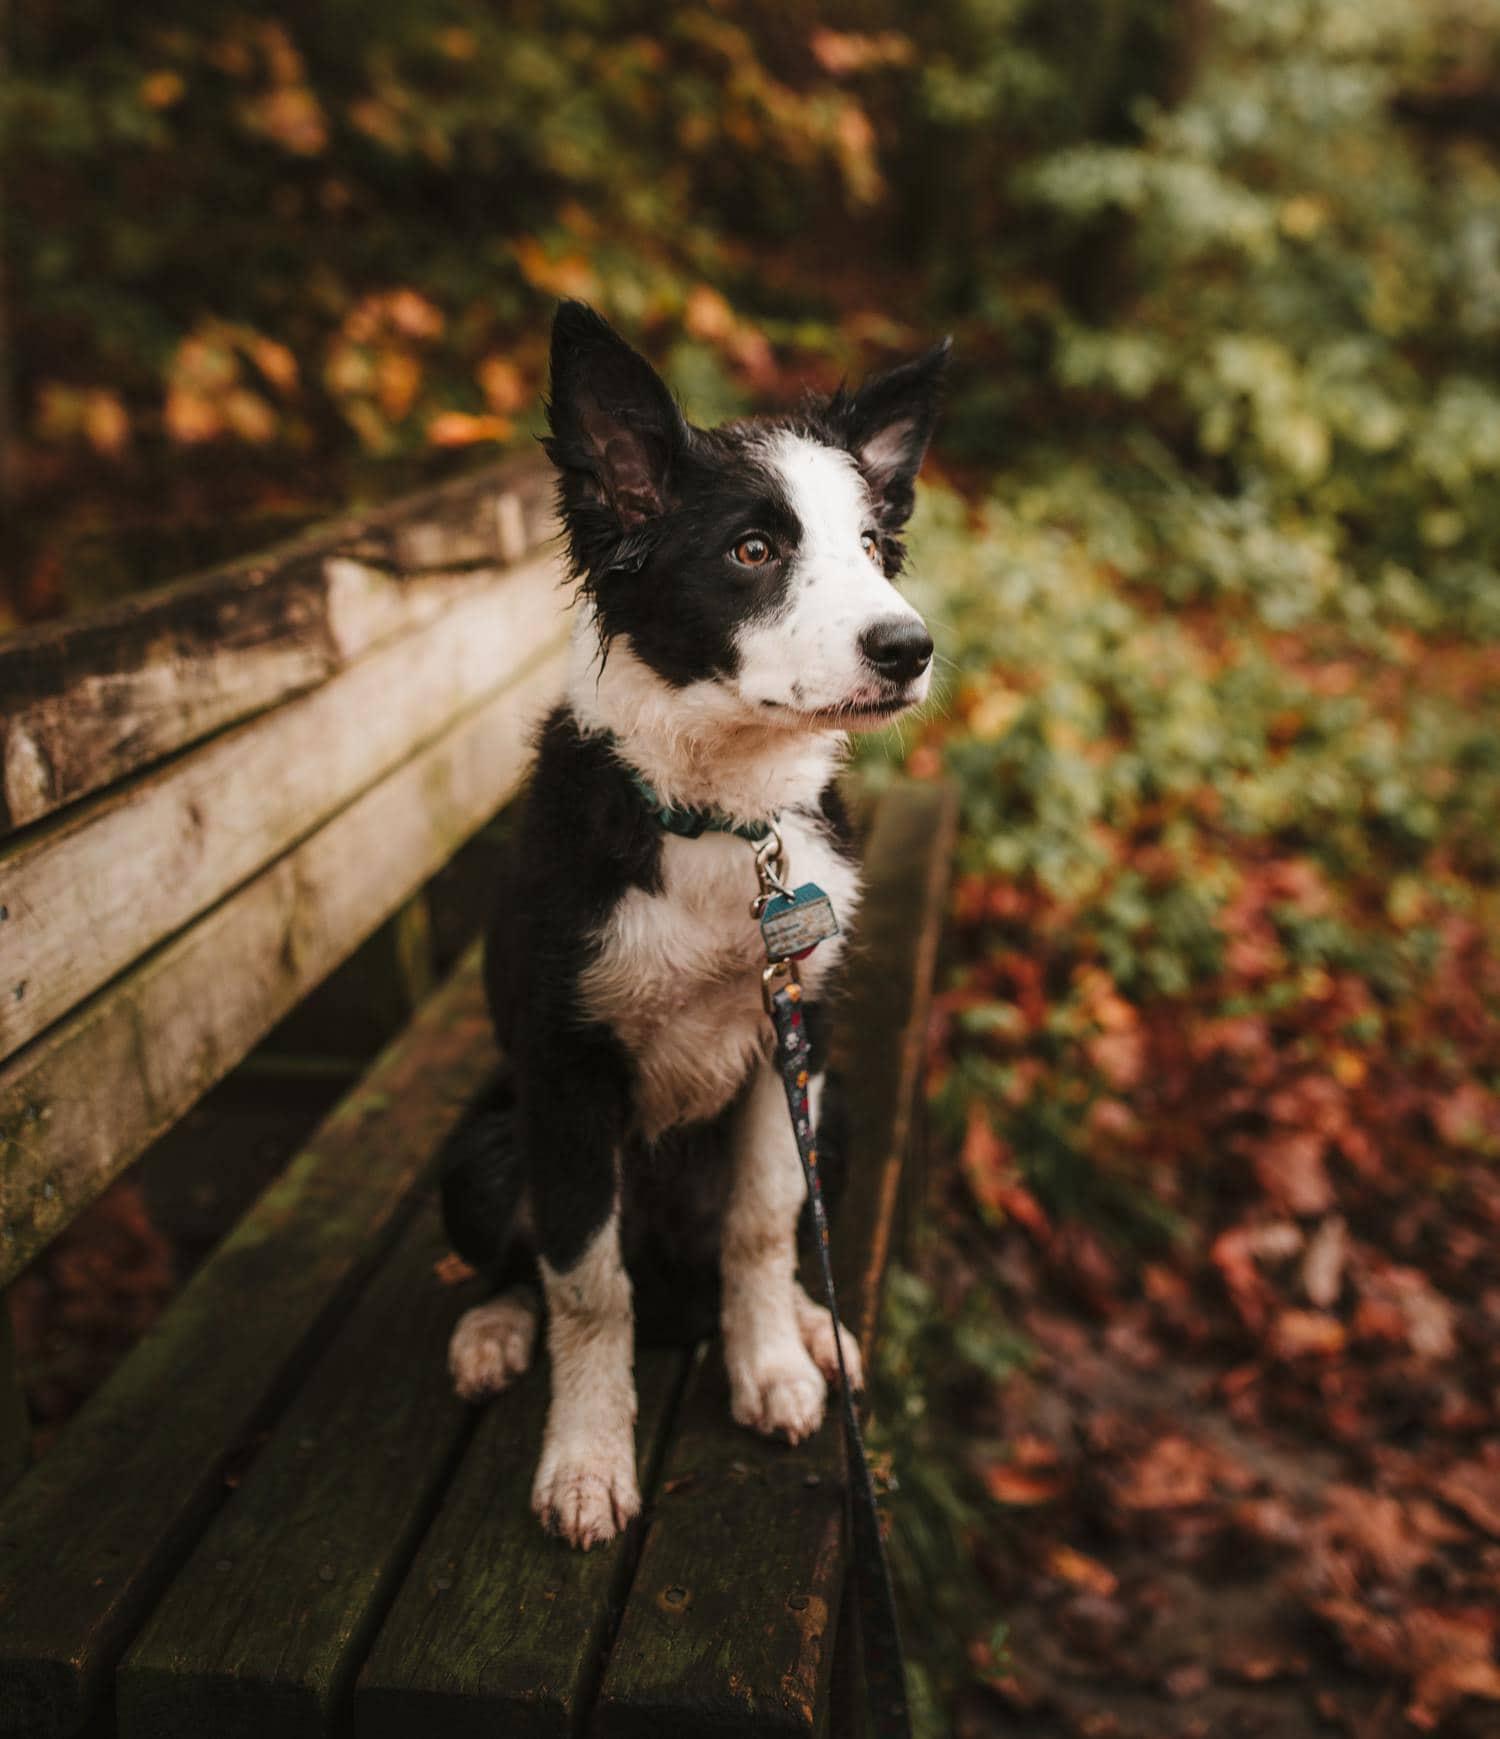 objetivo mascotas perro 35mm